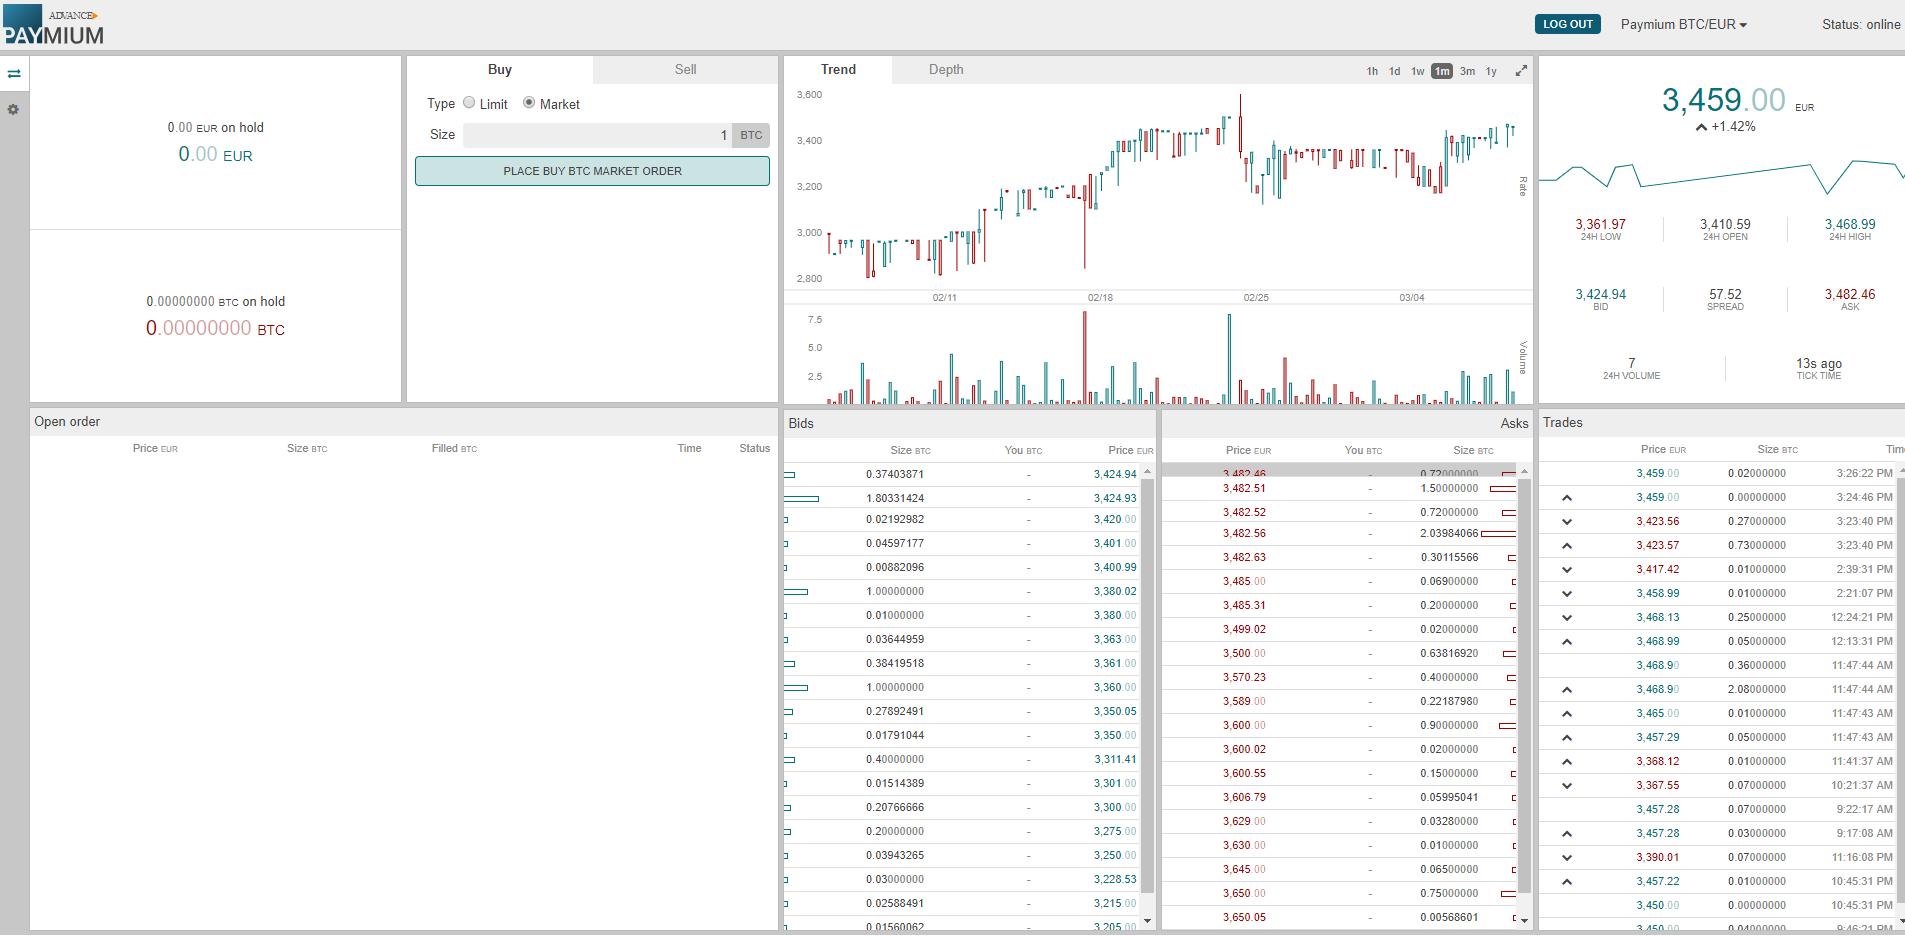 Paymium Trading View